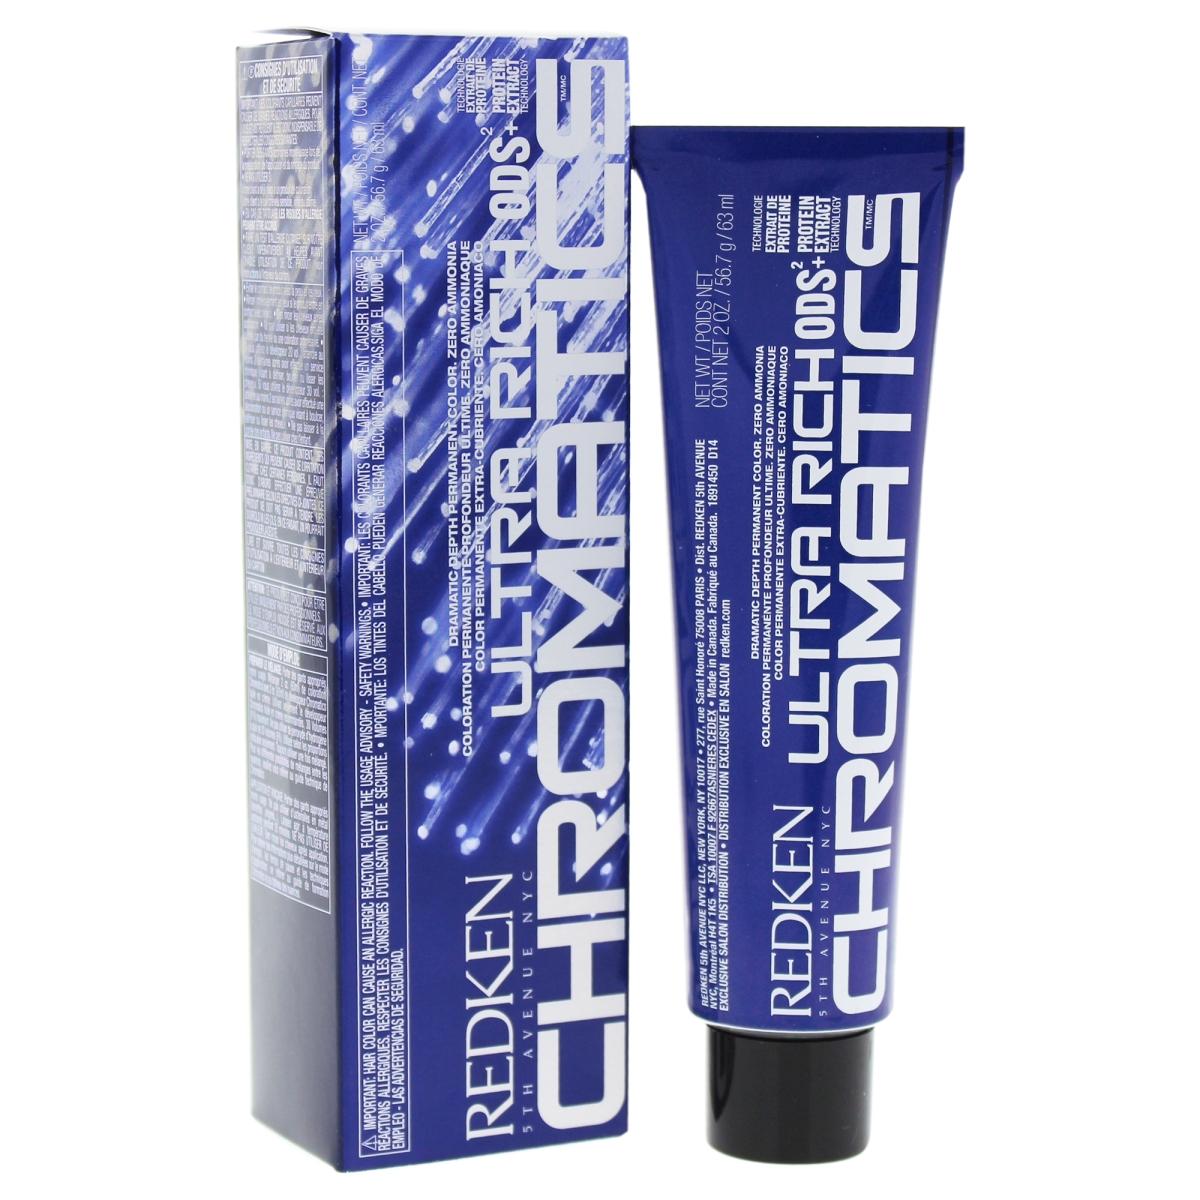 Redken U-HC-11827 2 oz Chromatics Ultra Rich Hair Color for Unisex - 8P Pearl